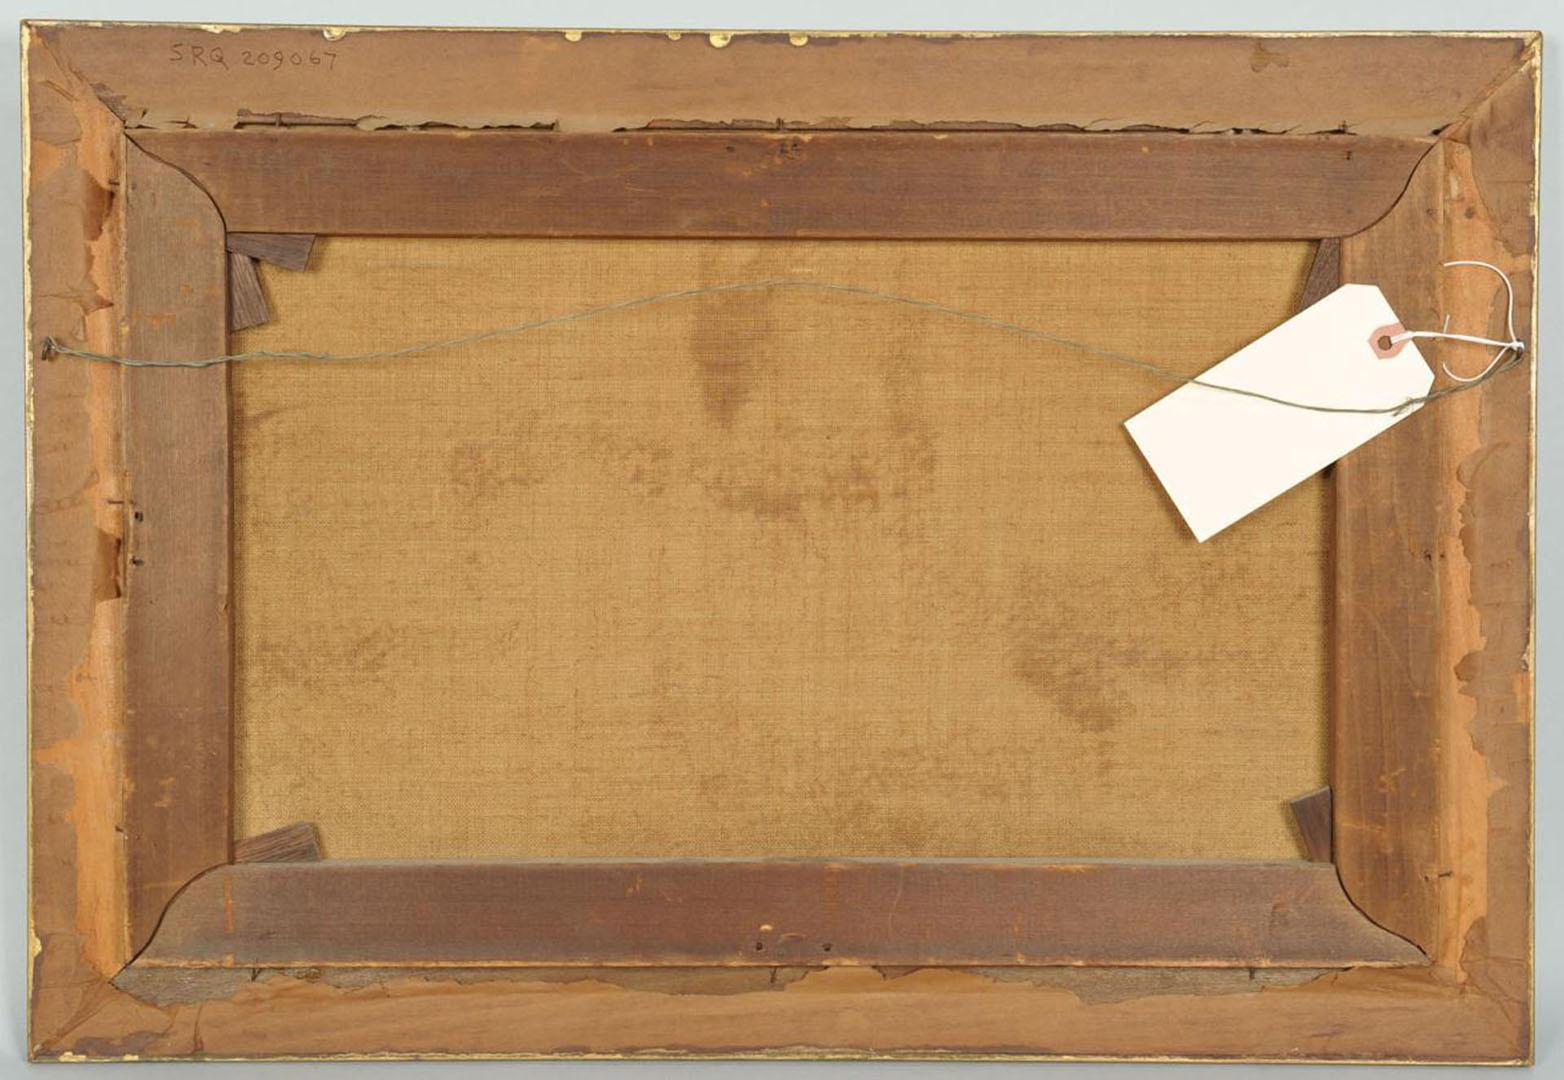 Lot 2872252: Daniel C. Grose oil on canvas, Indian Bazaar